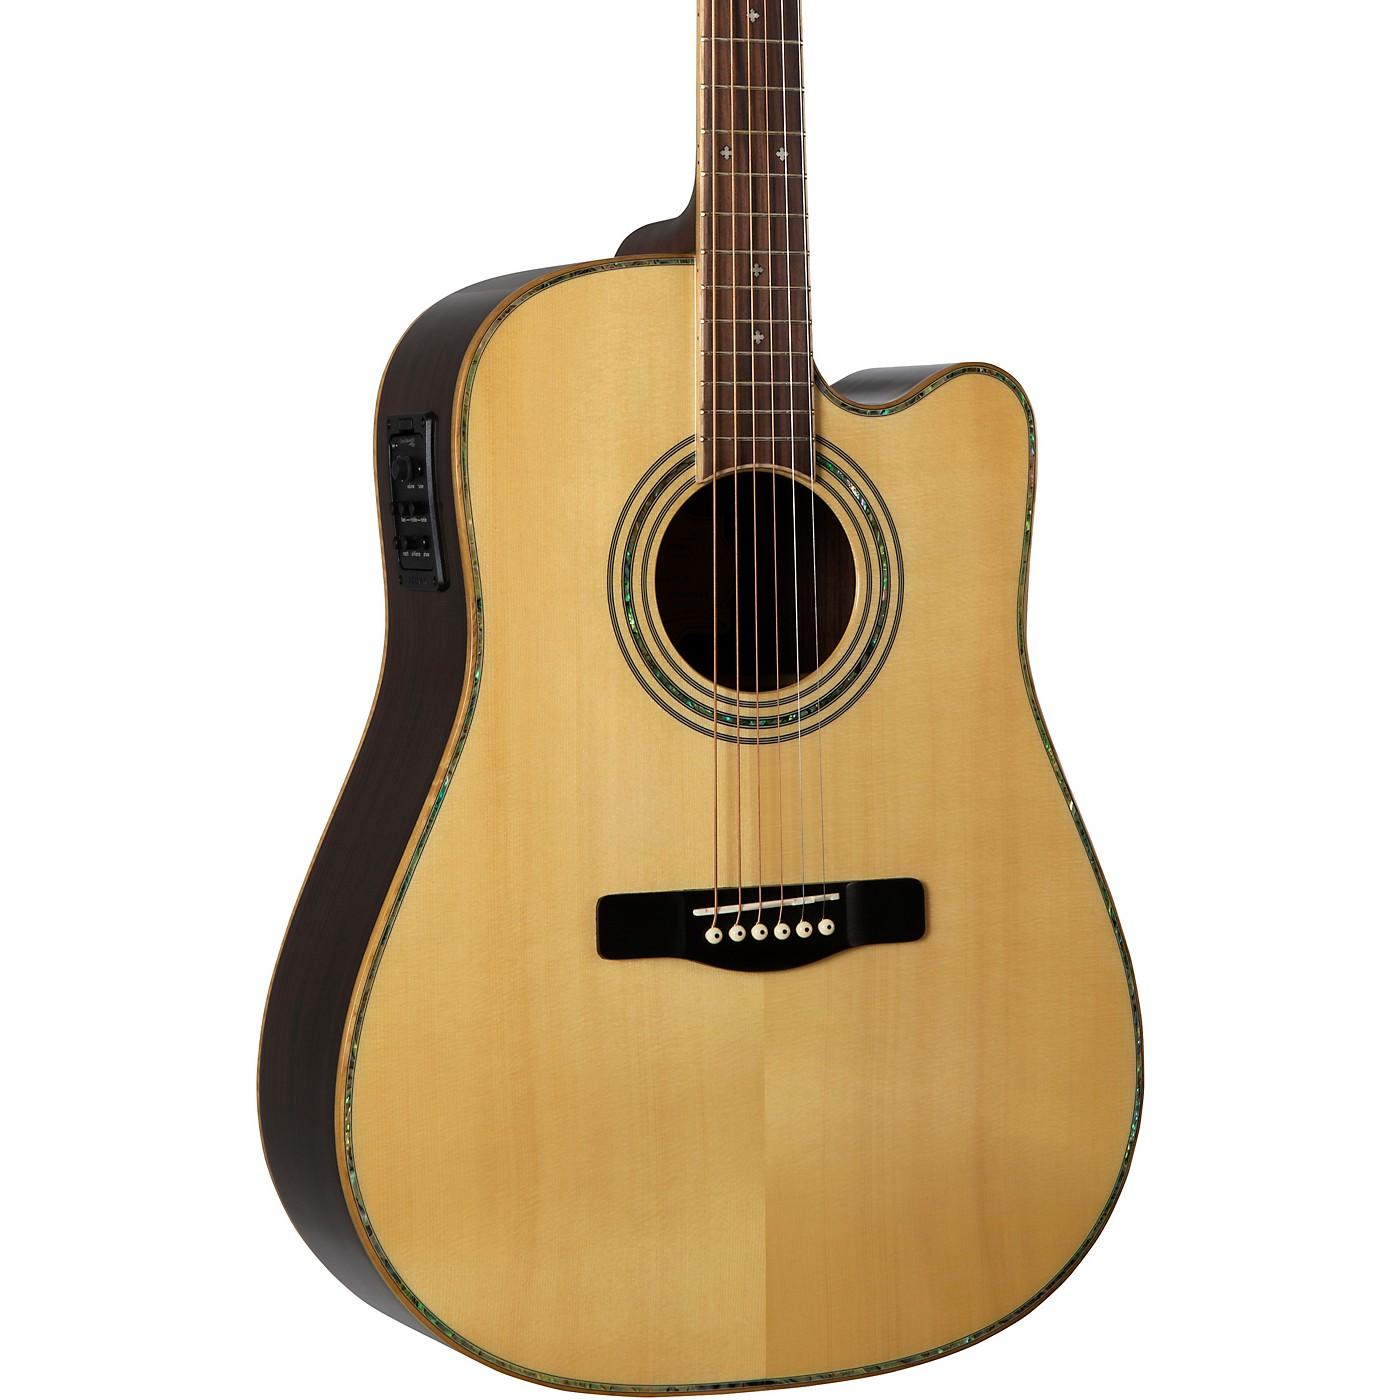 Greg Bennett Design by Samick ASDRCE Dreadnaught Cutaway Solid Spruce Top Acstc-Elec Guitar thumbnail